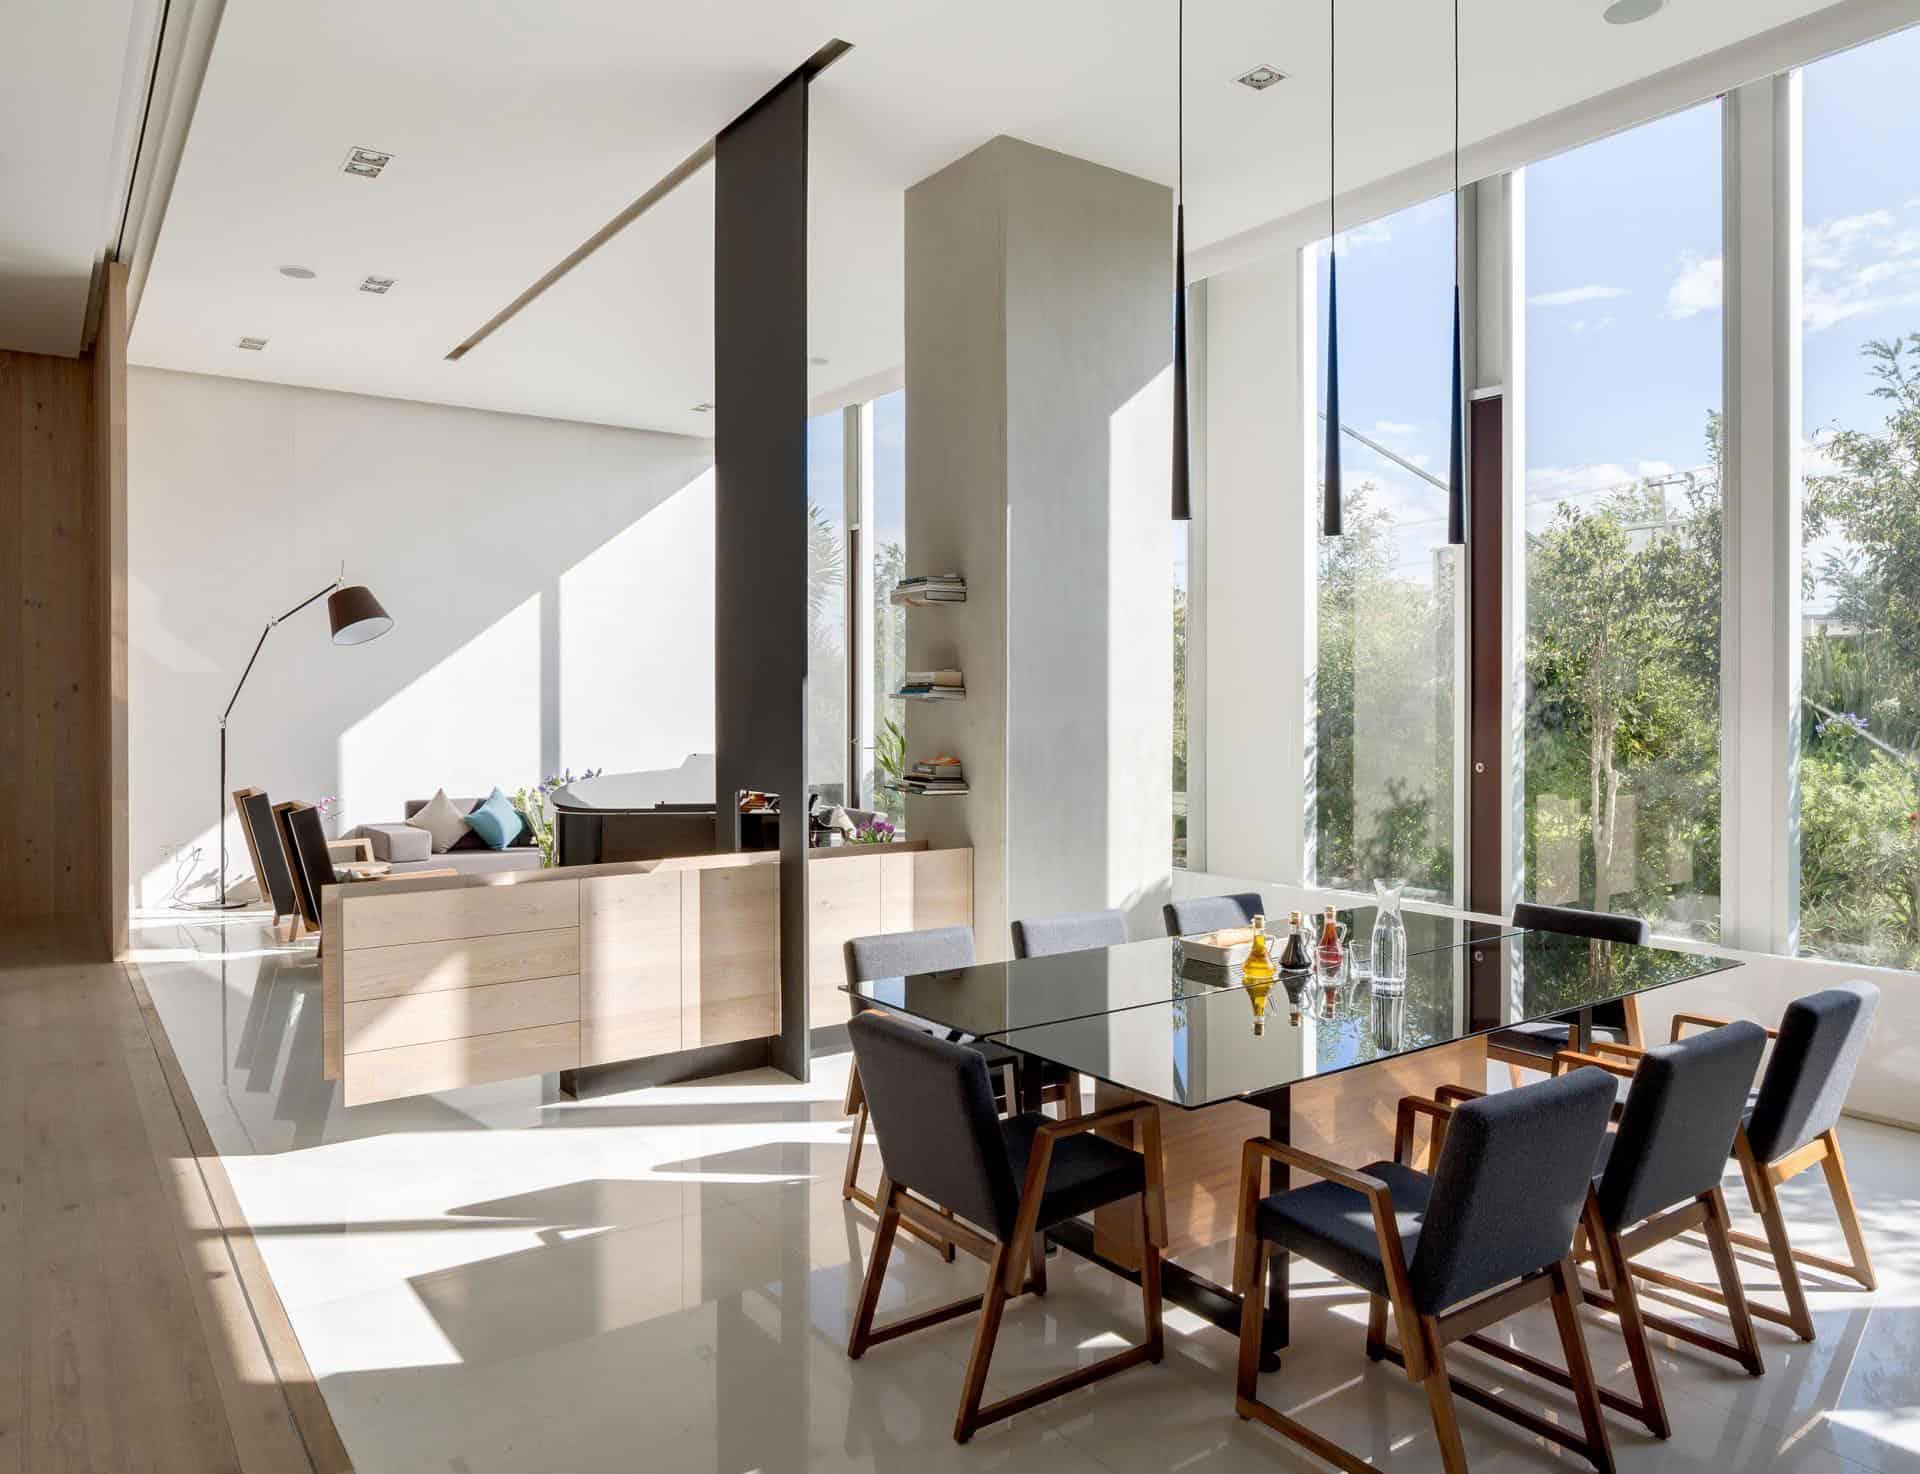 Archetonic Designs a Contemporary Apartment in Mexico City